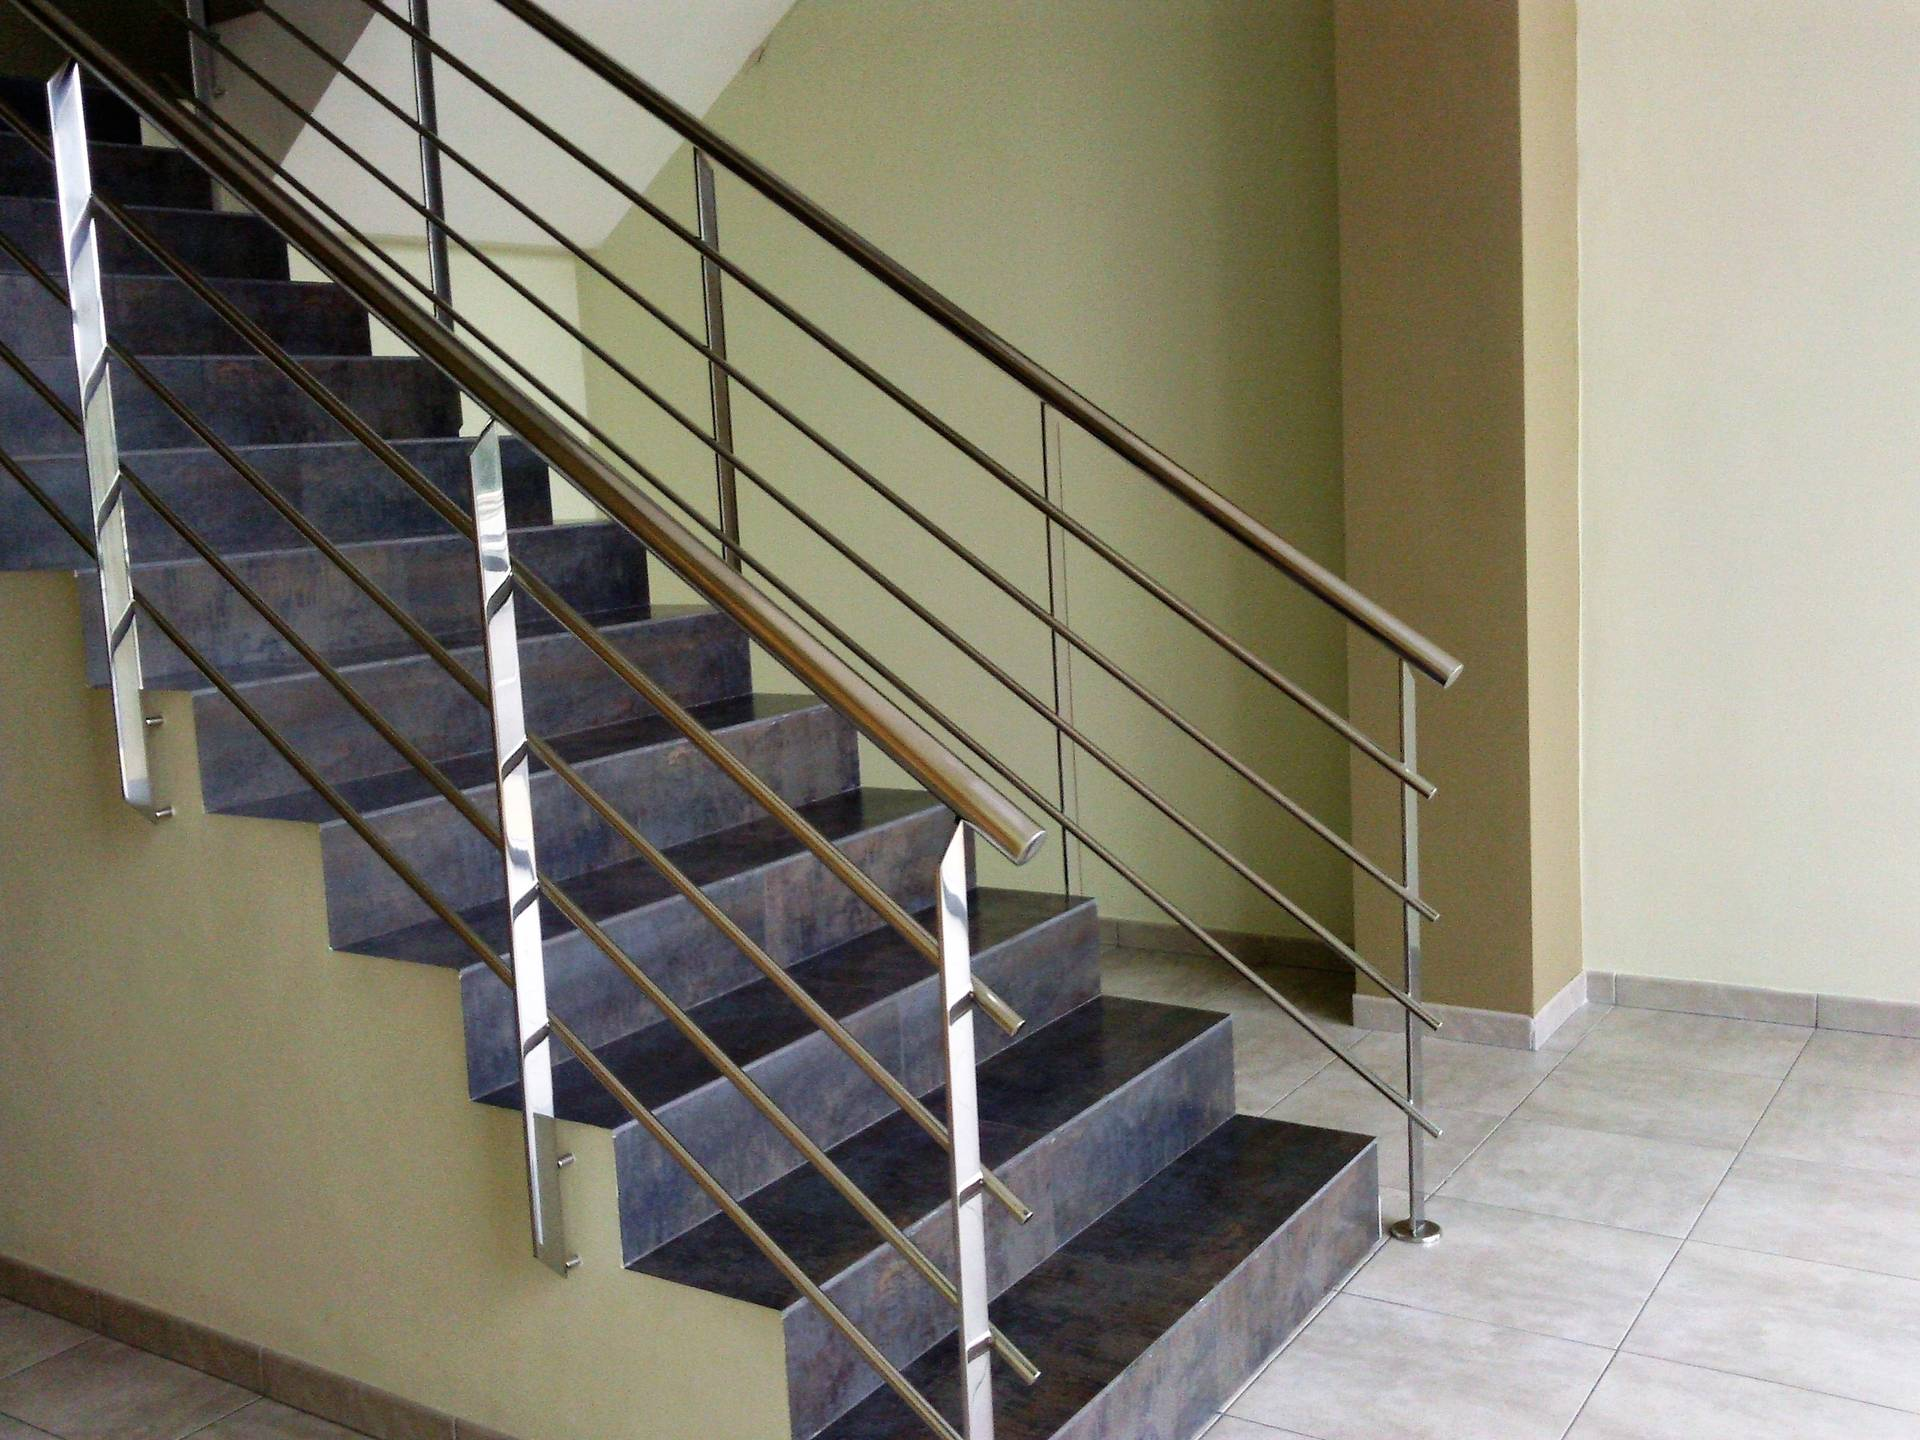 Barandas de escalera - Barandas de escaleras de madera ...